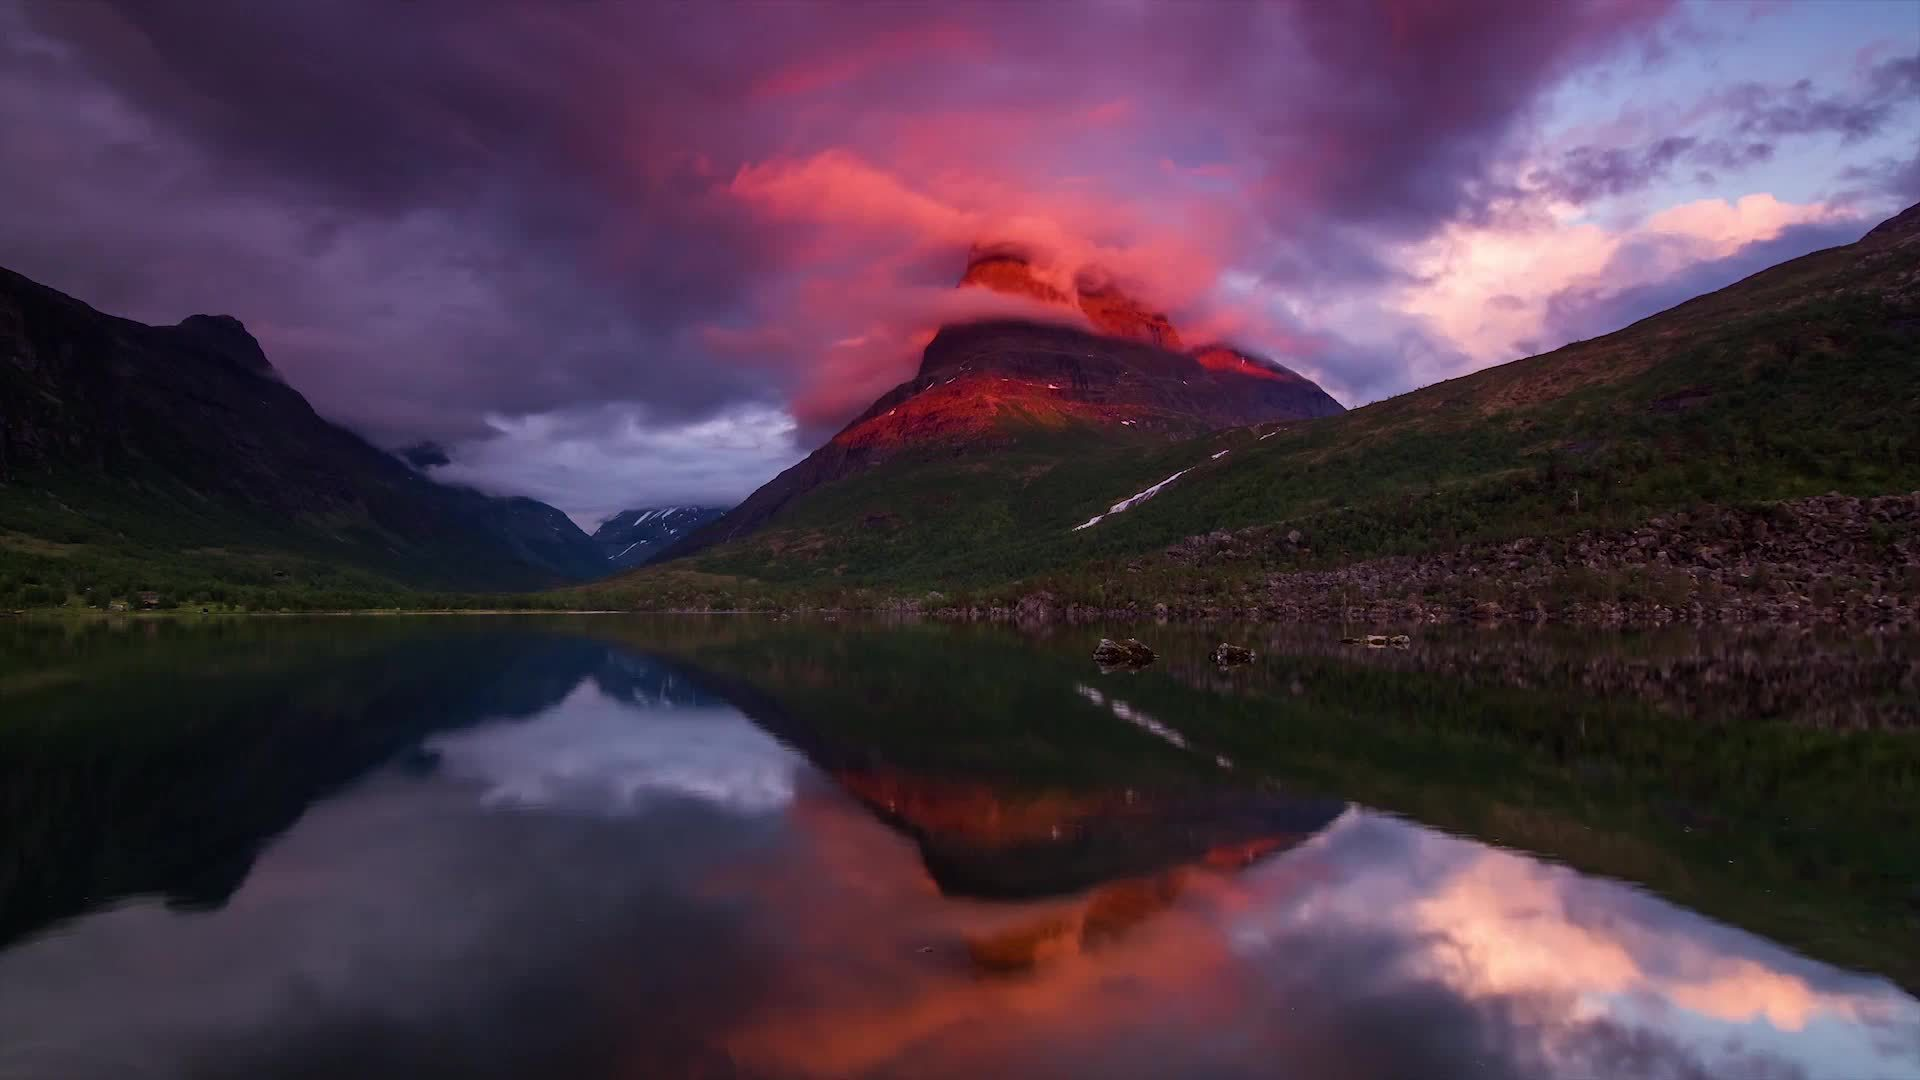 FiftyFifty, NorwayPics, Innerdal, Norway by Morten Rustad (reddit) GIFs